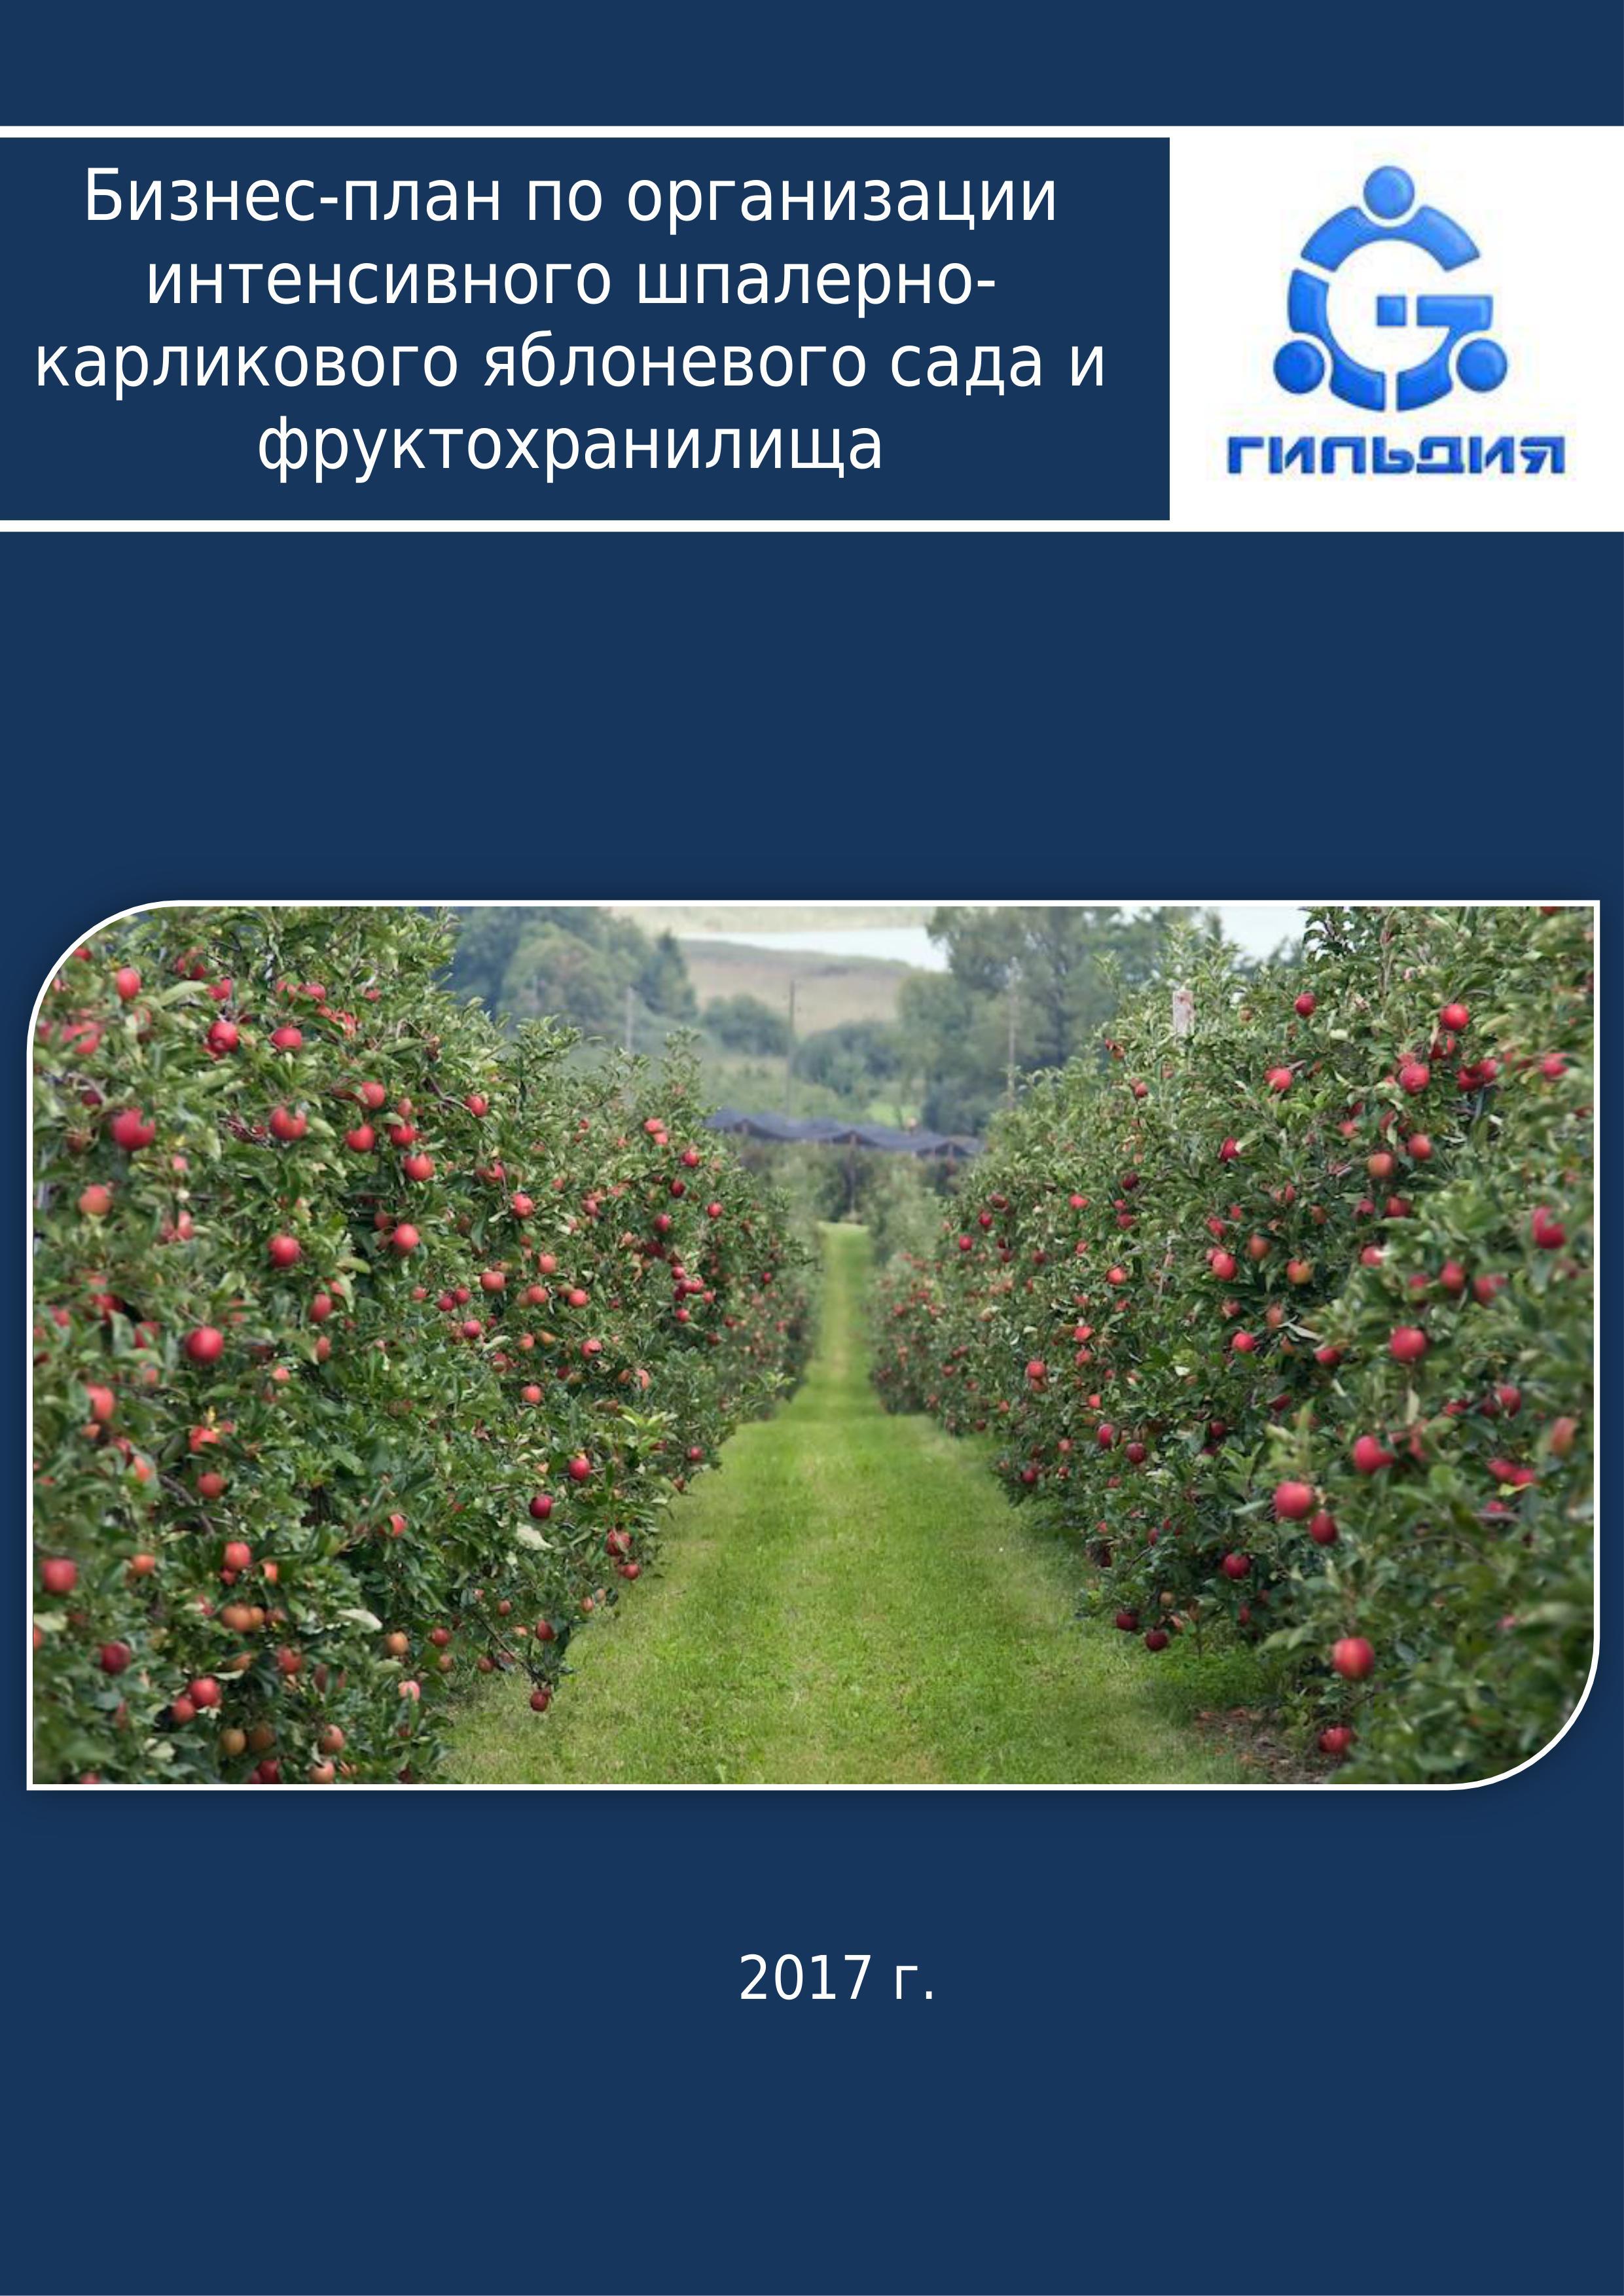 Бизнес план фруктохранилища проект бизнес план отдела